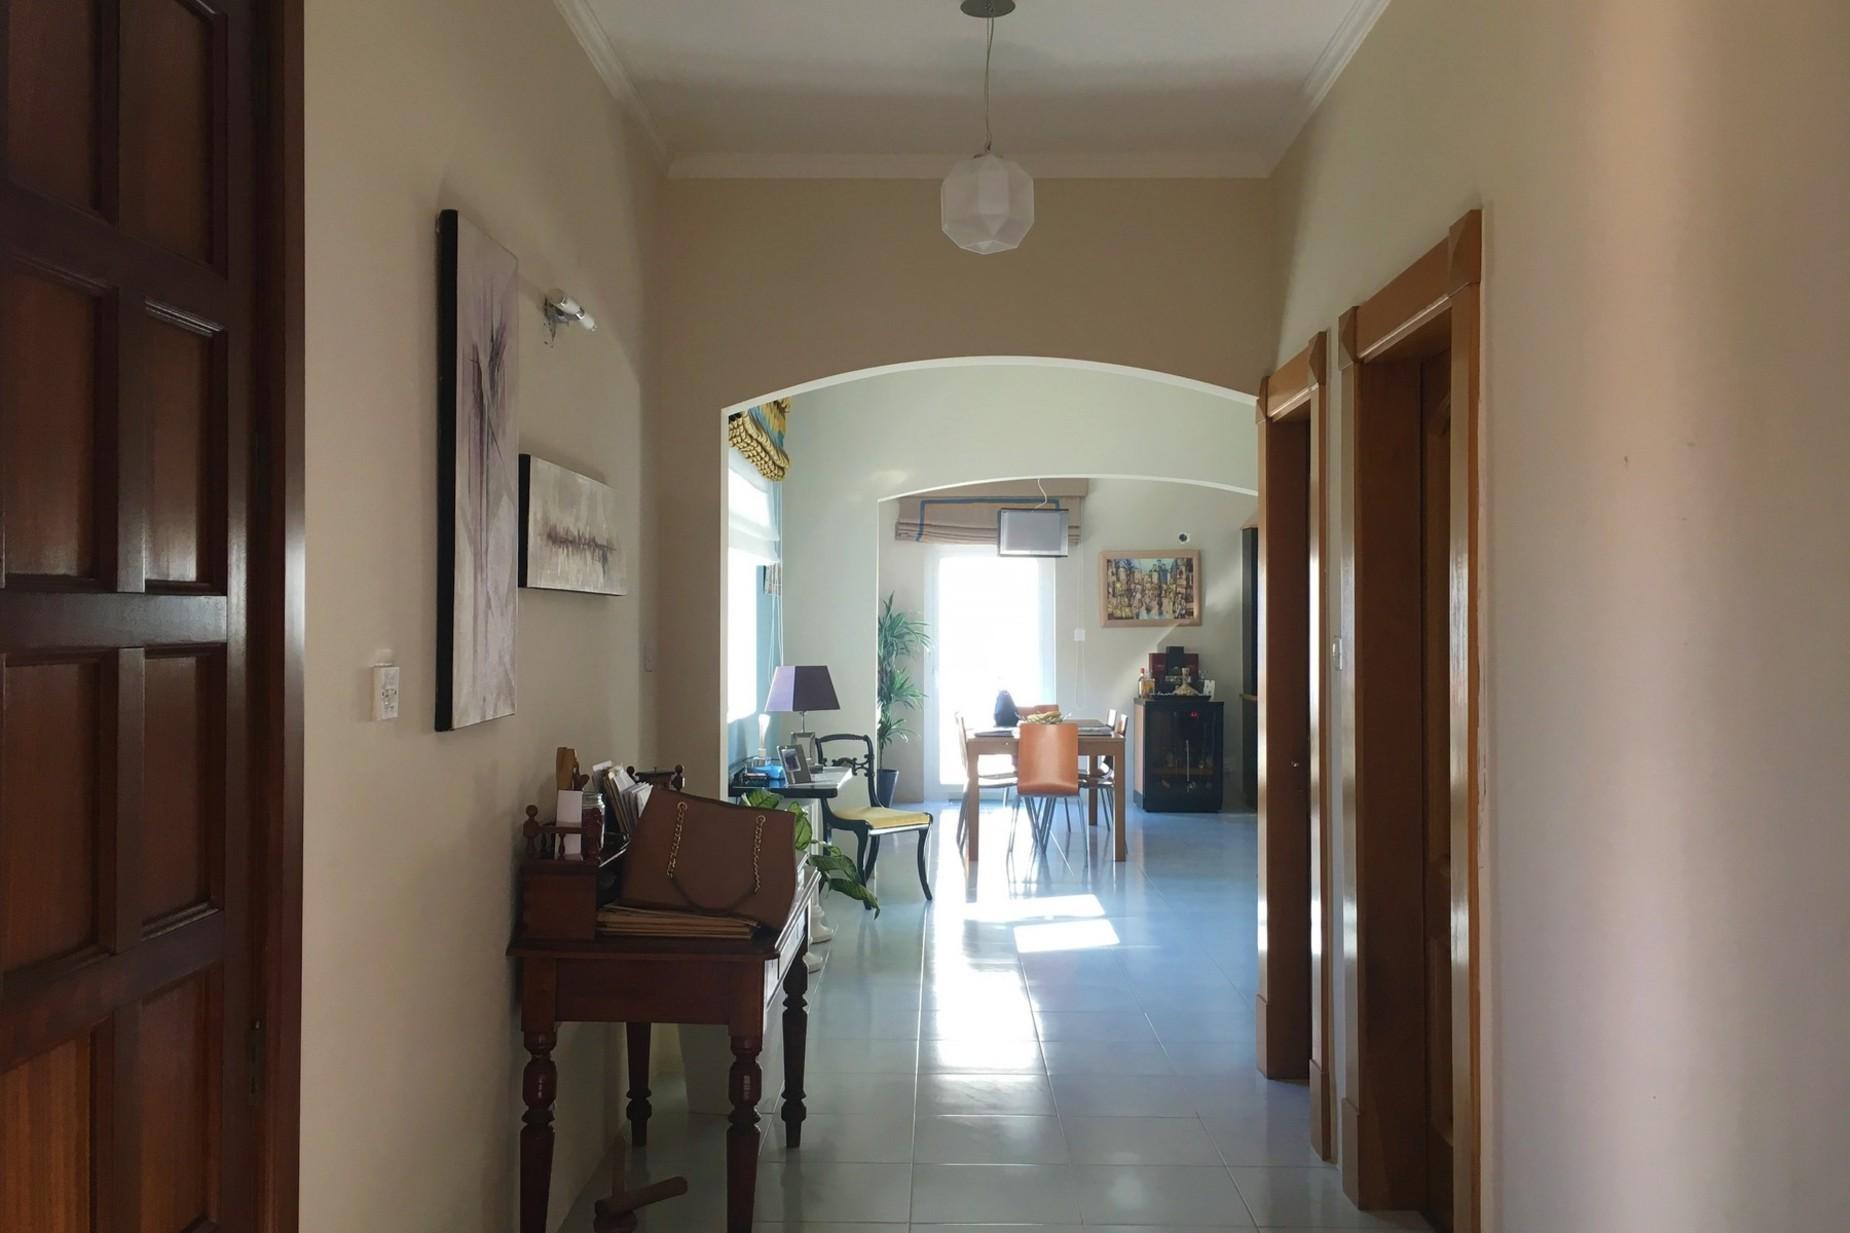 3 bed Villa For Sale in Pembroke, Pembroke - thumb 3